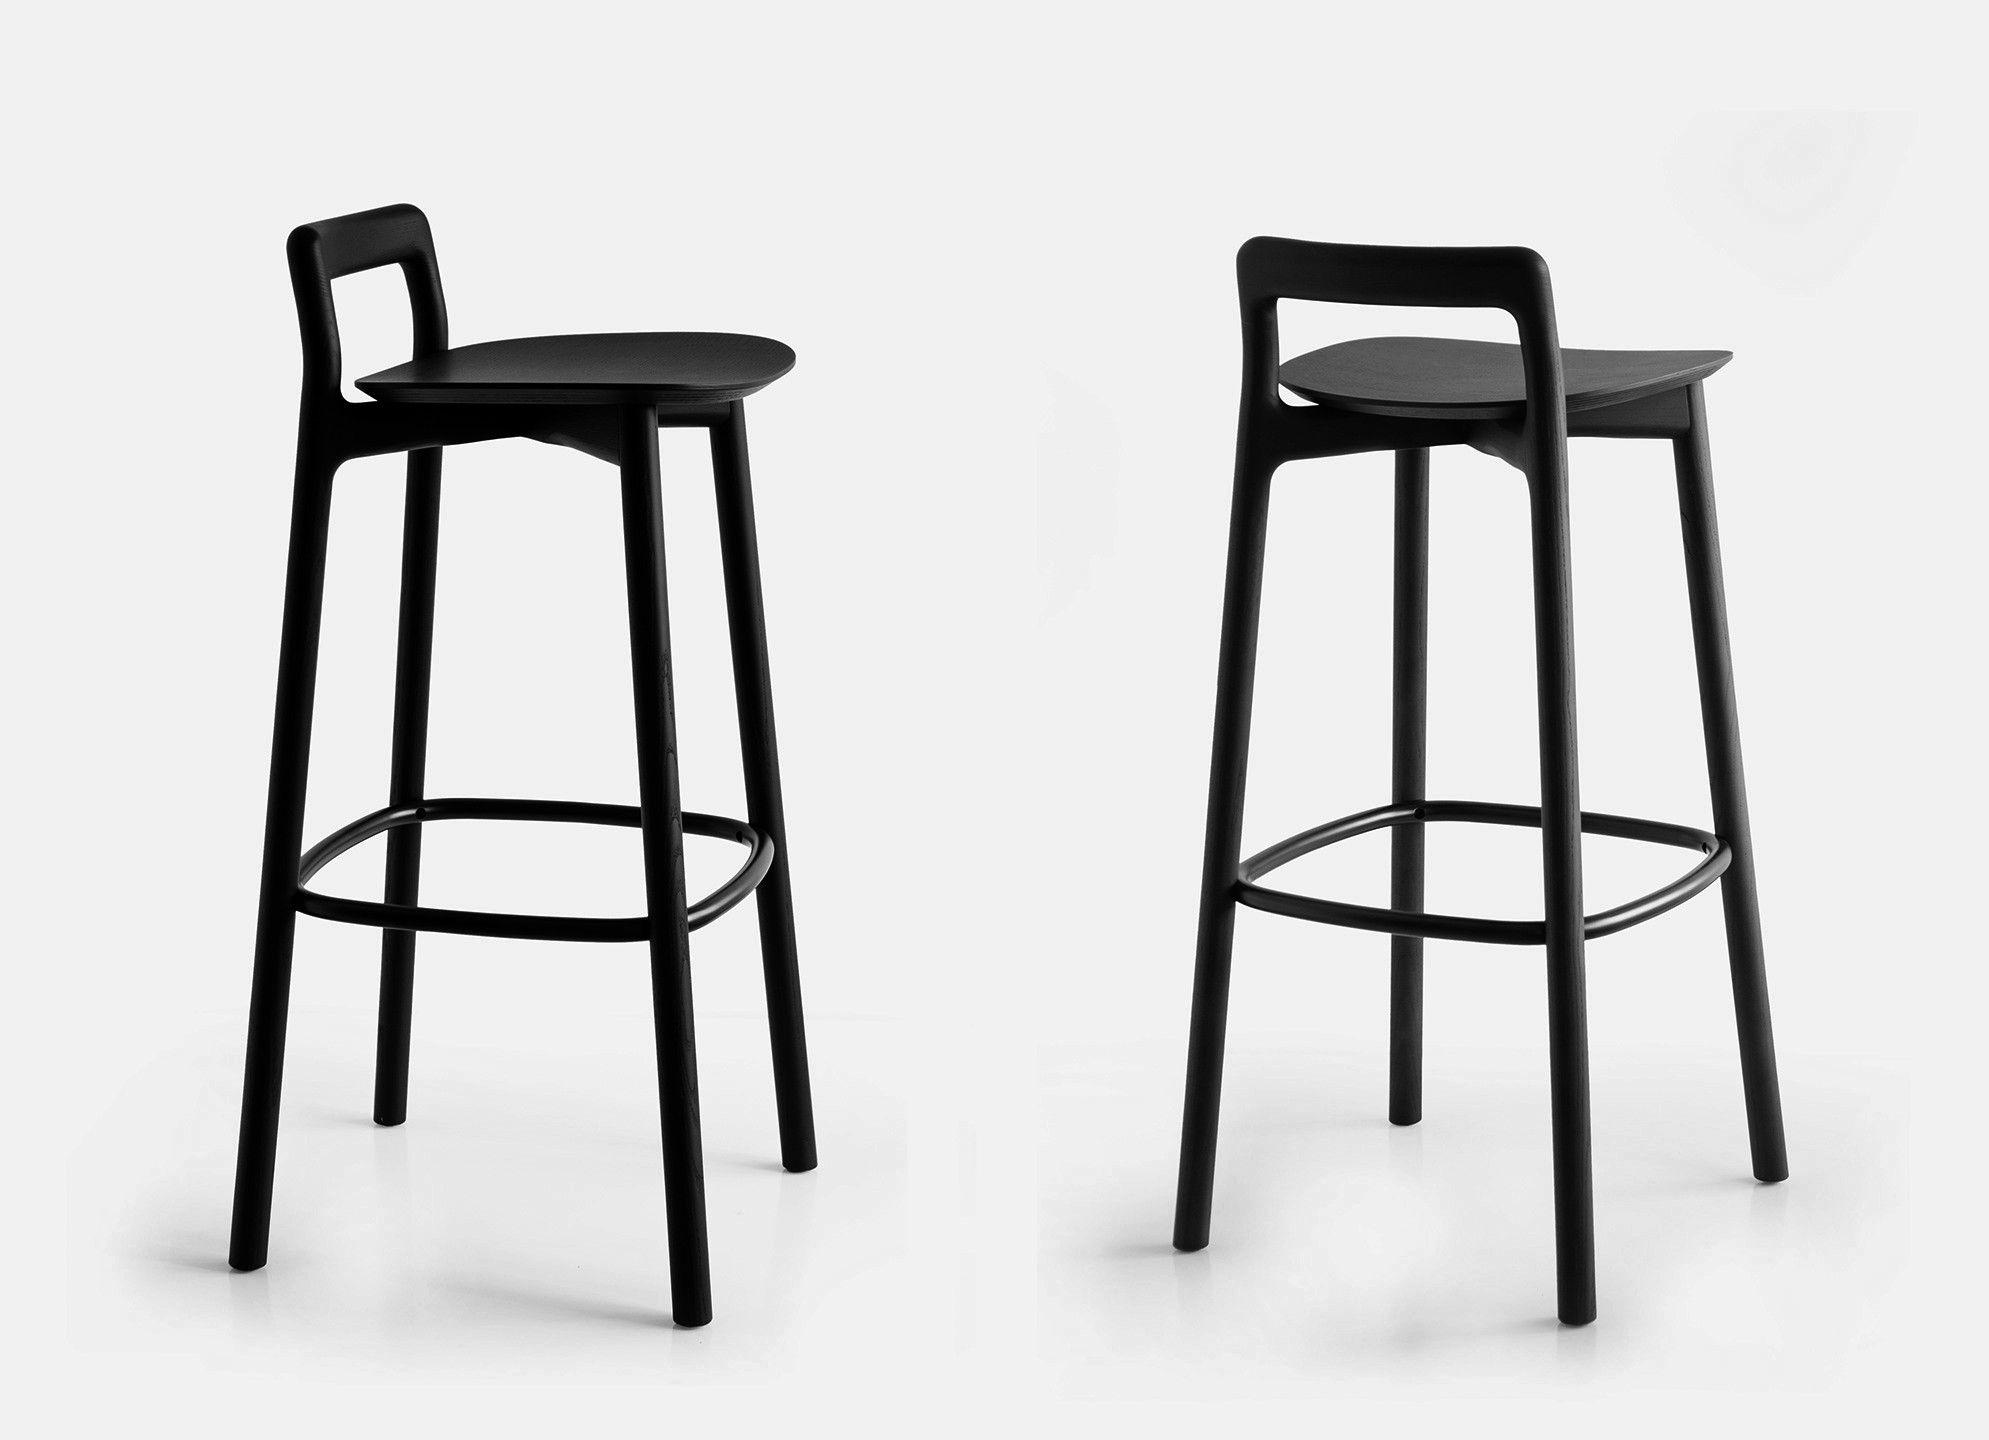 Industrial Facility Fournitre Branca stool created for Italian